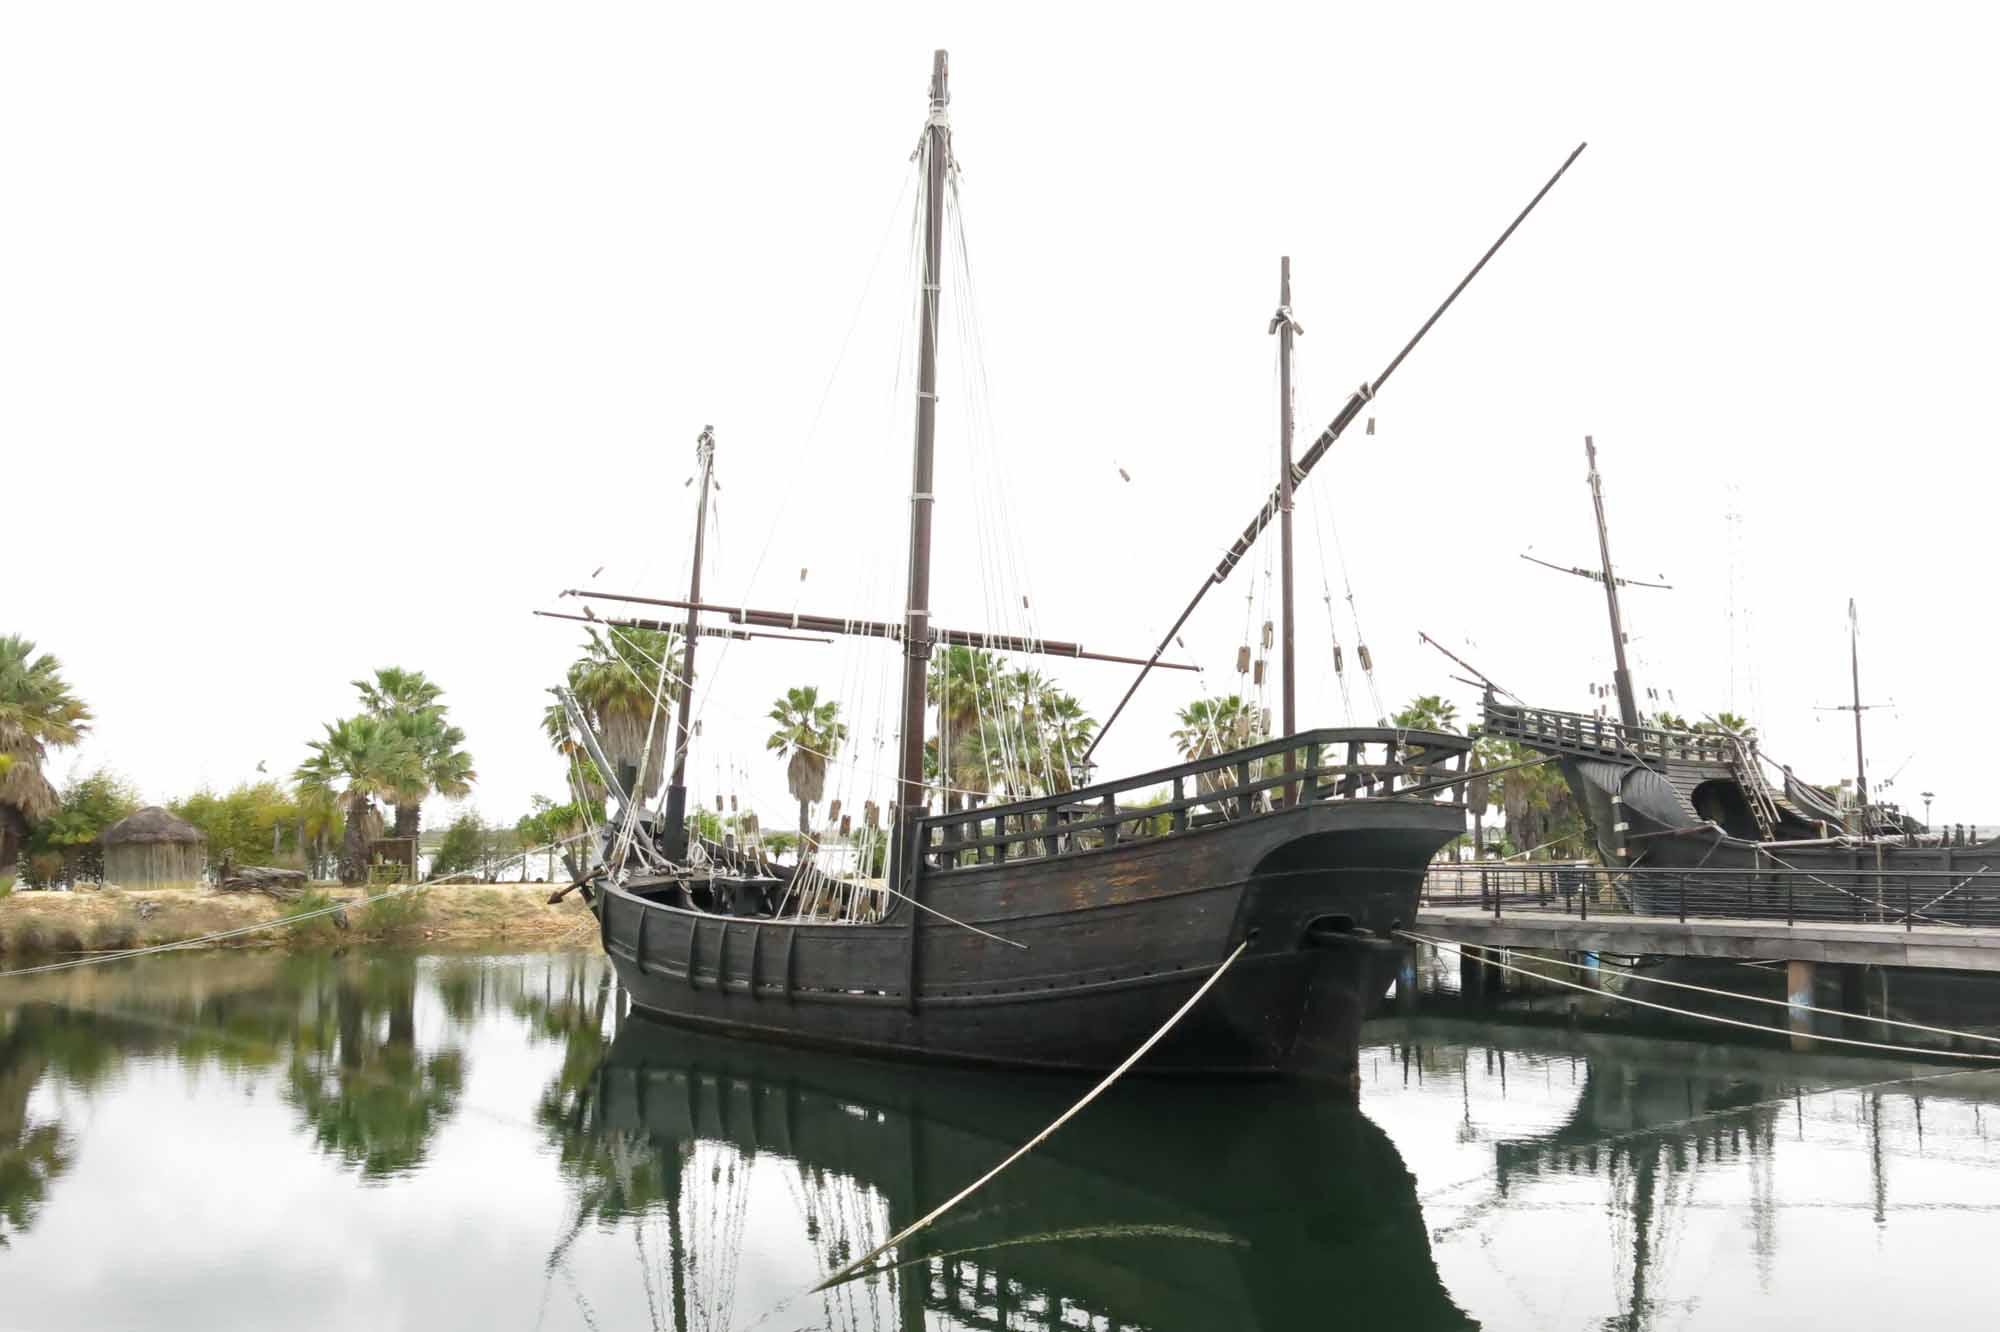 Photos Replicas Of Columbus Ships Santa Maria Pinta And Nina